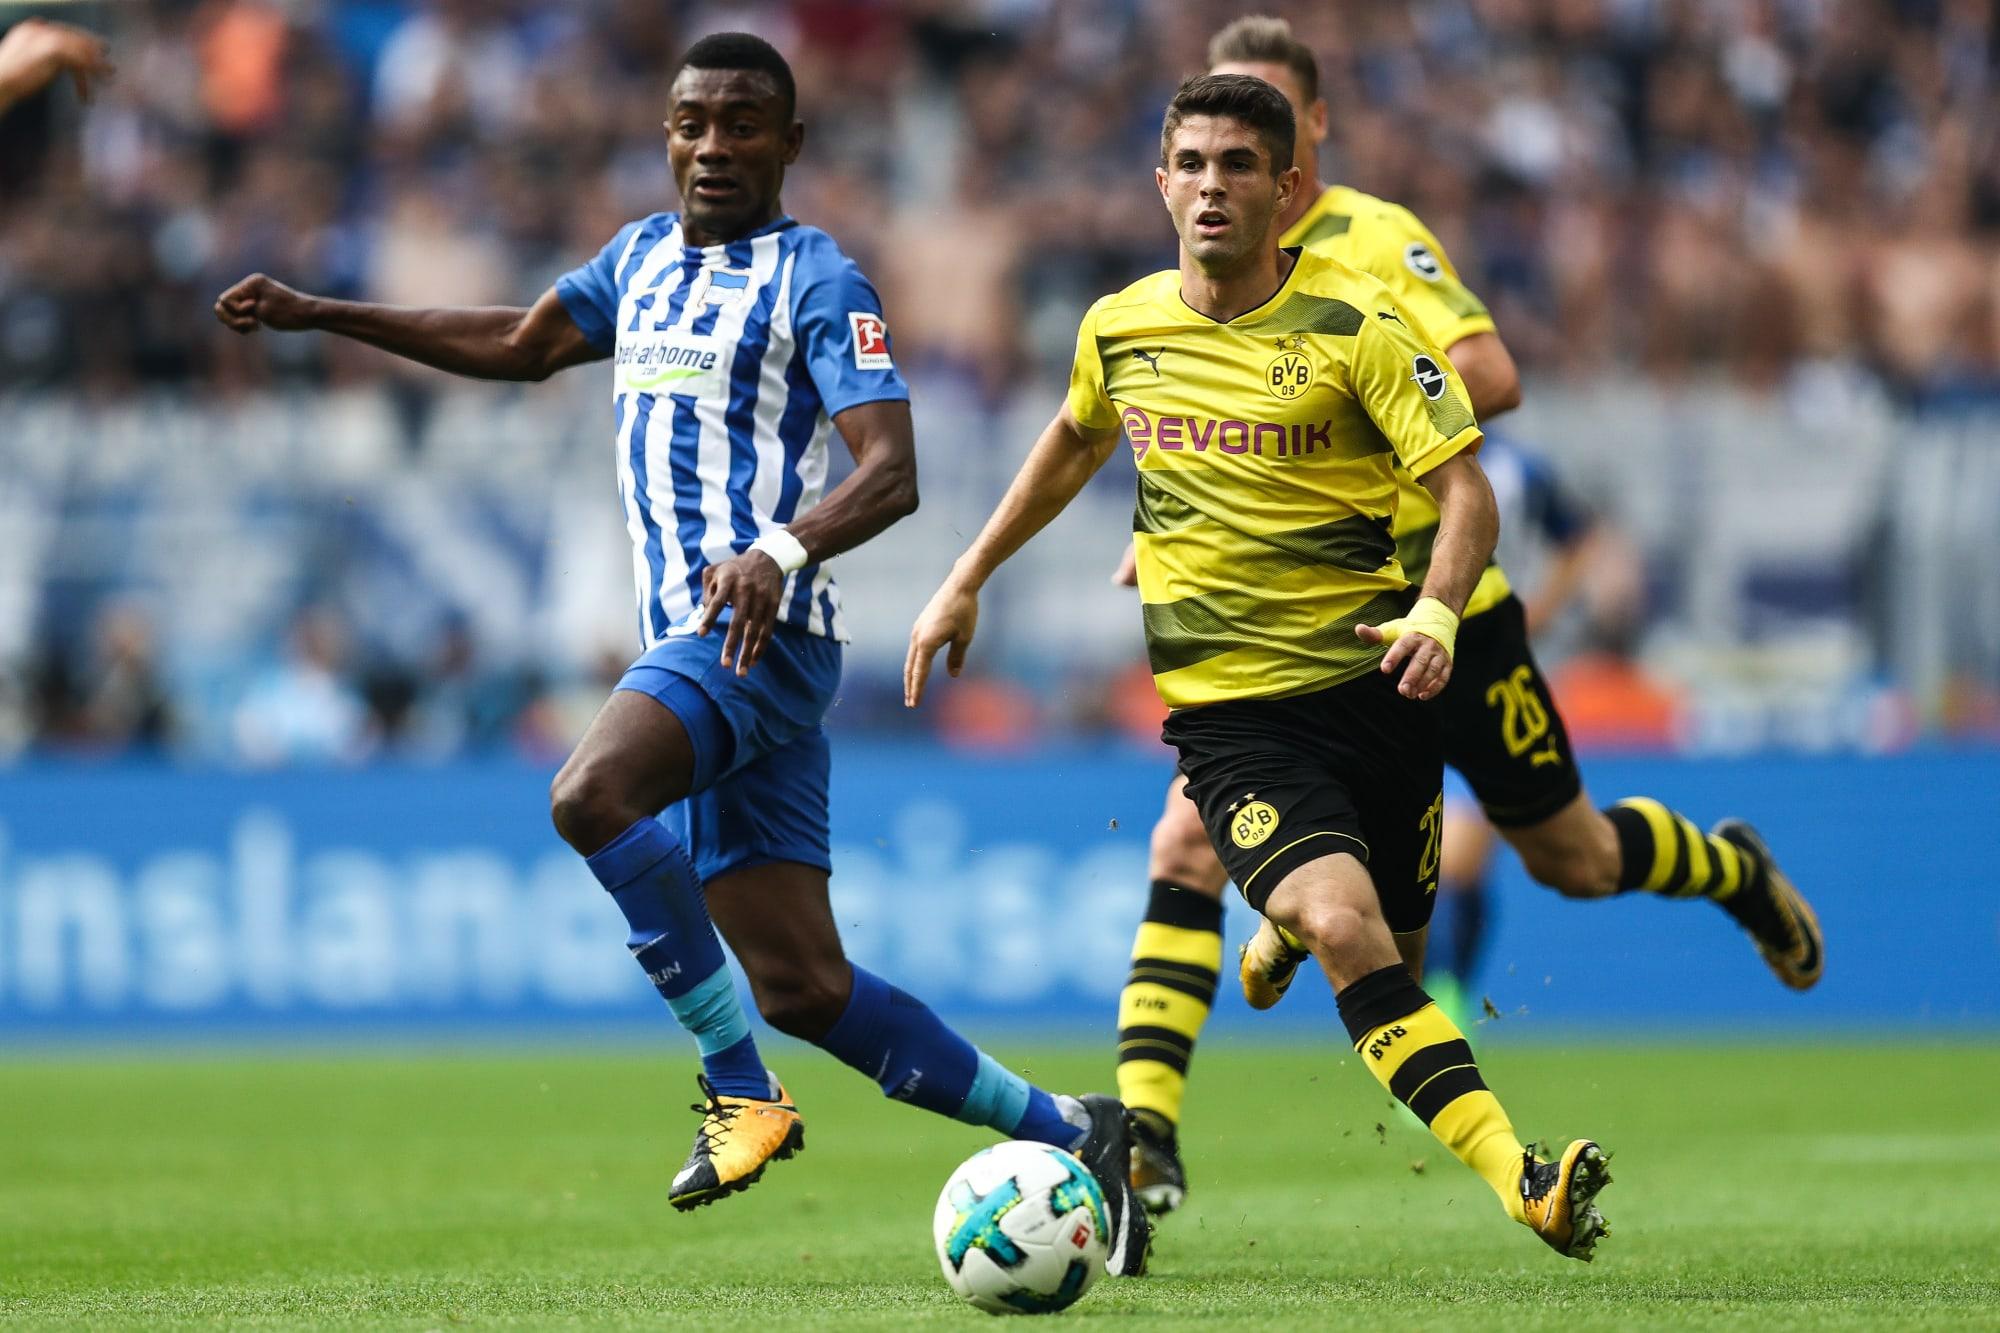 Dortmund Vs Köln Live Stream